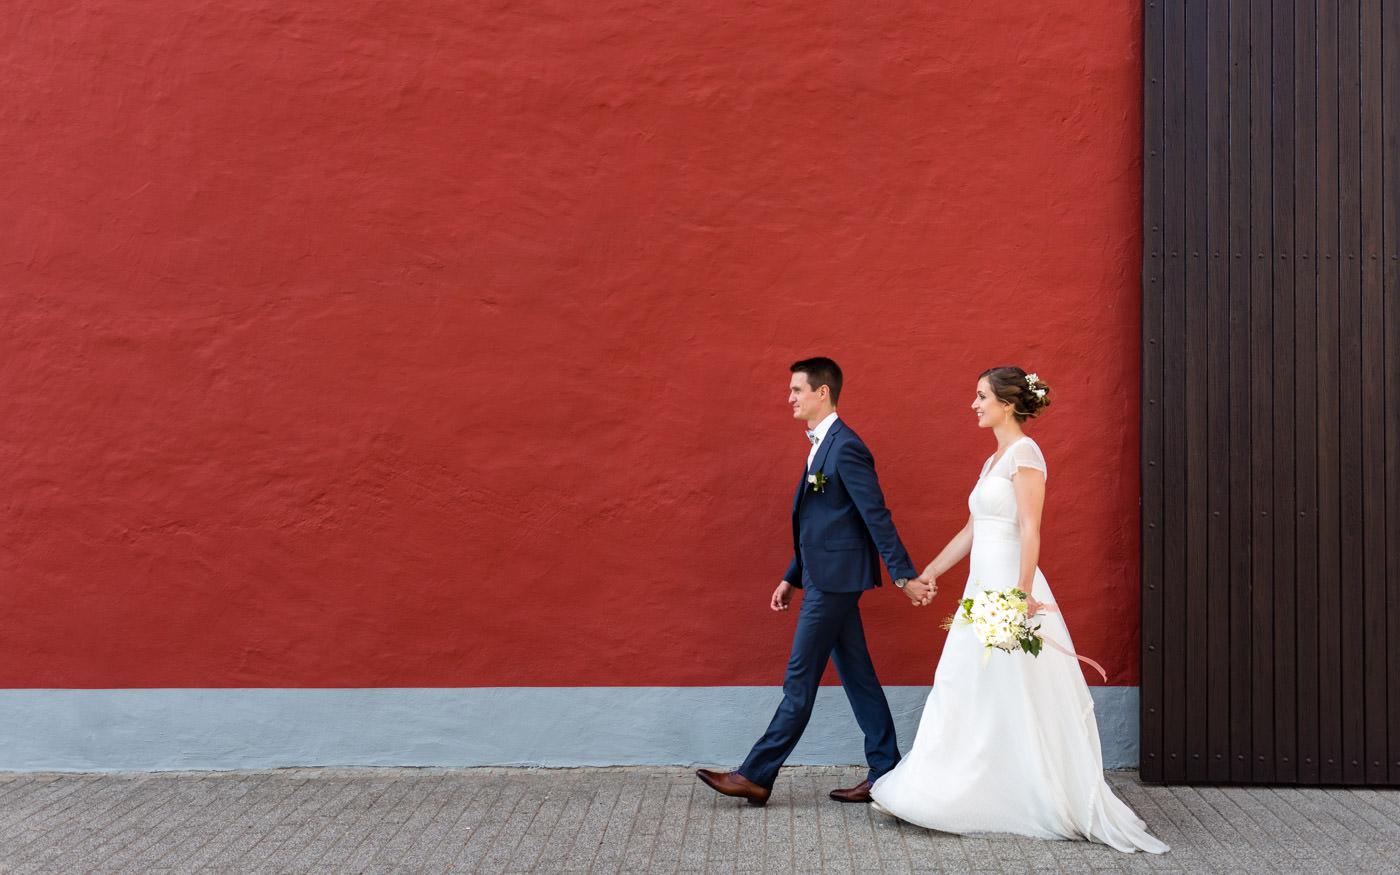 wedding photographer documentary